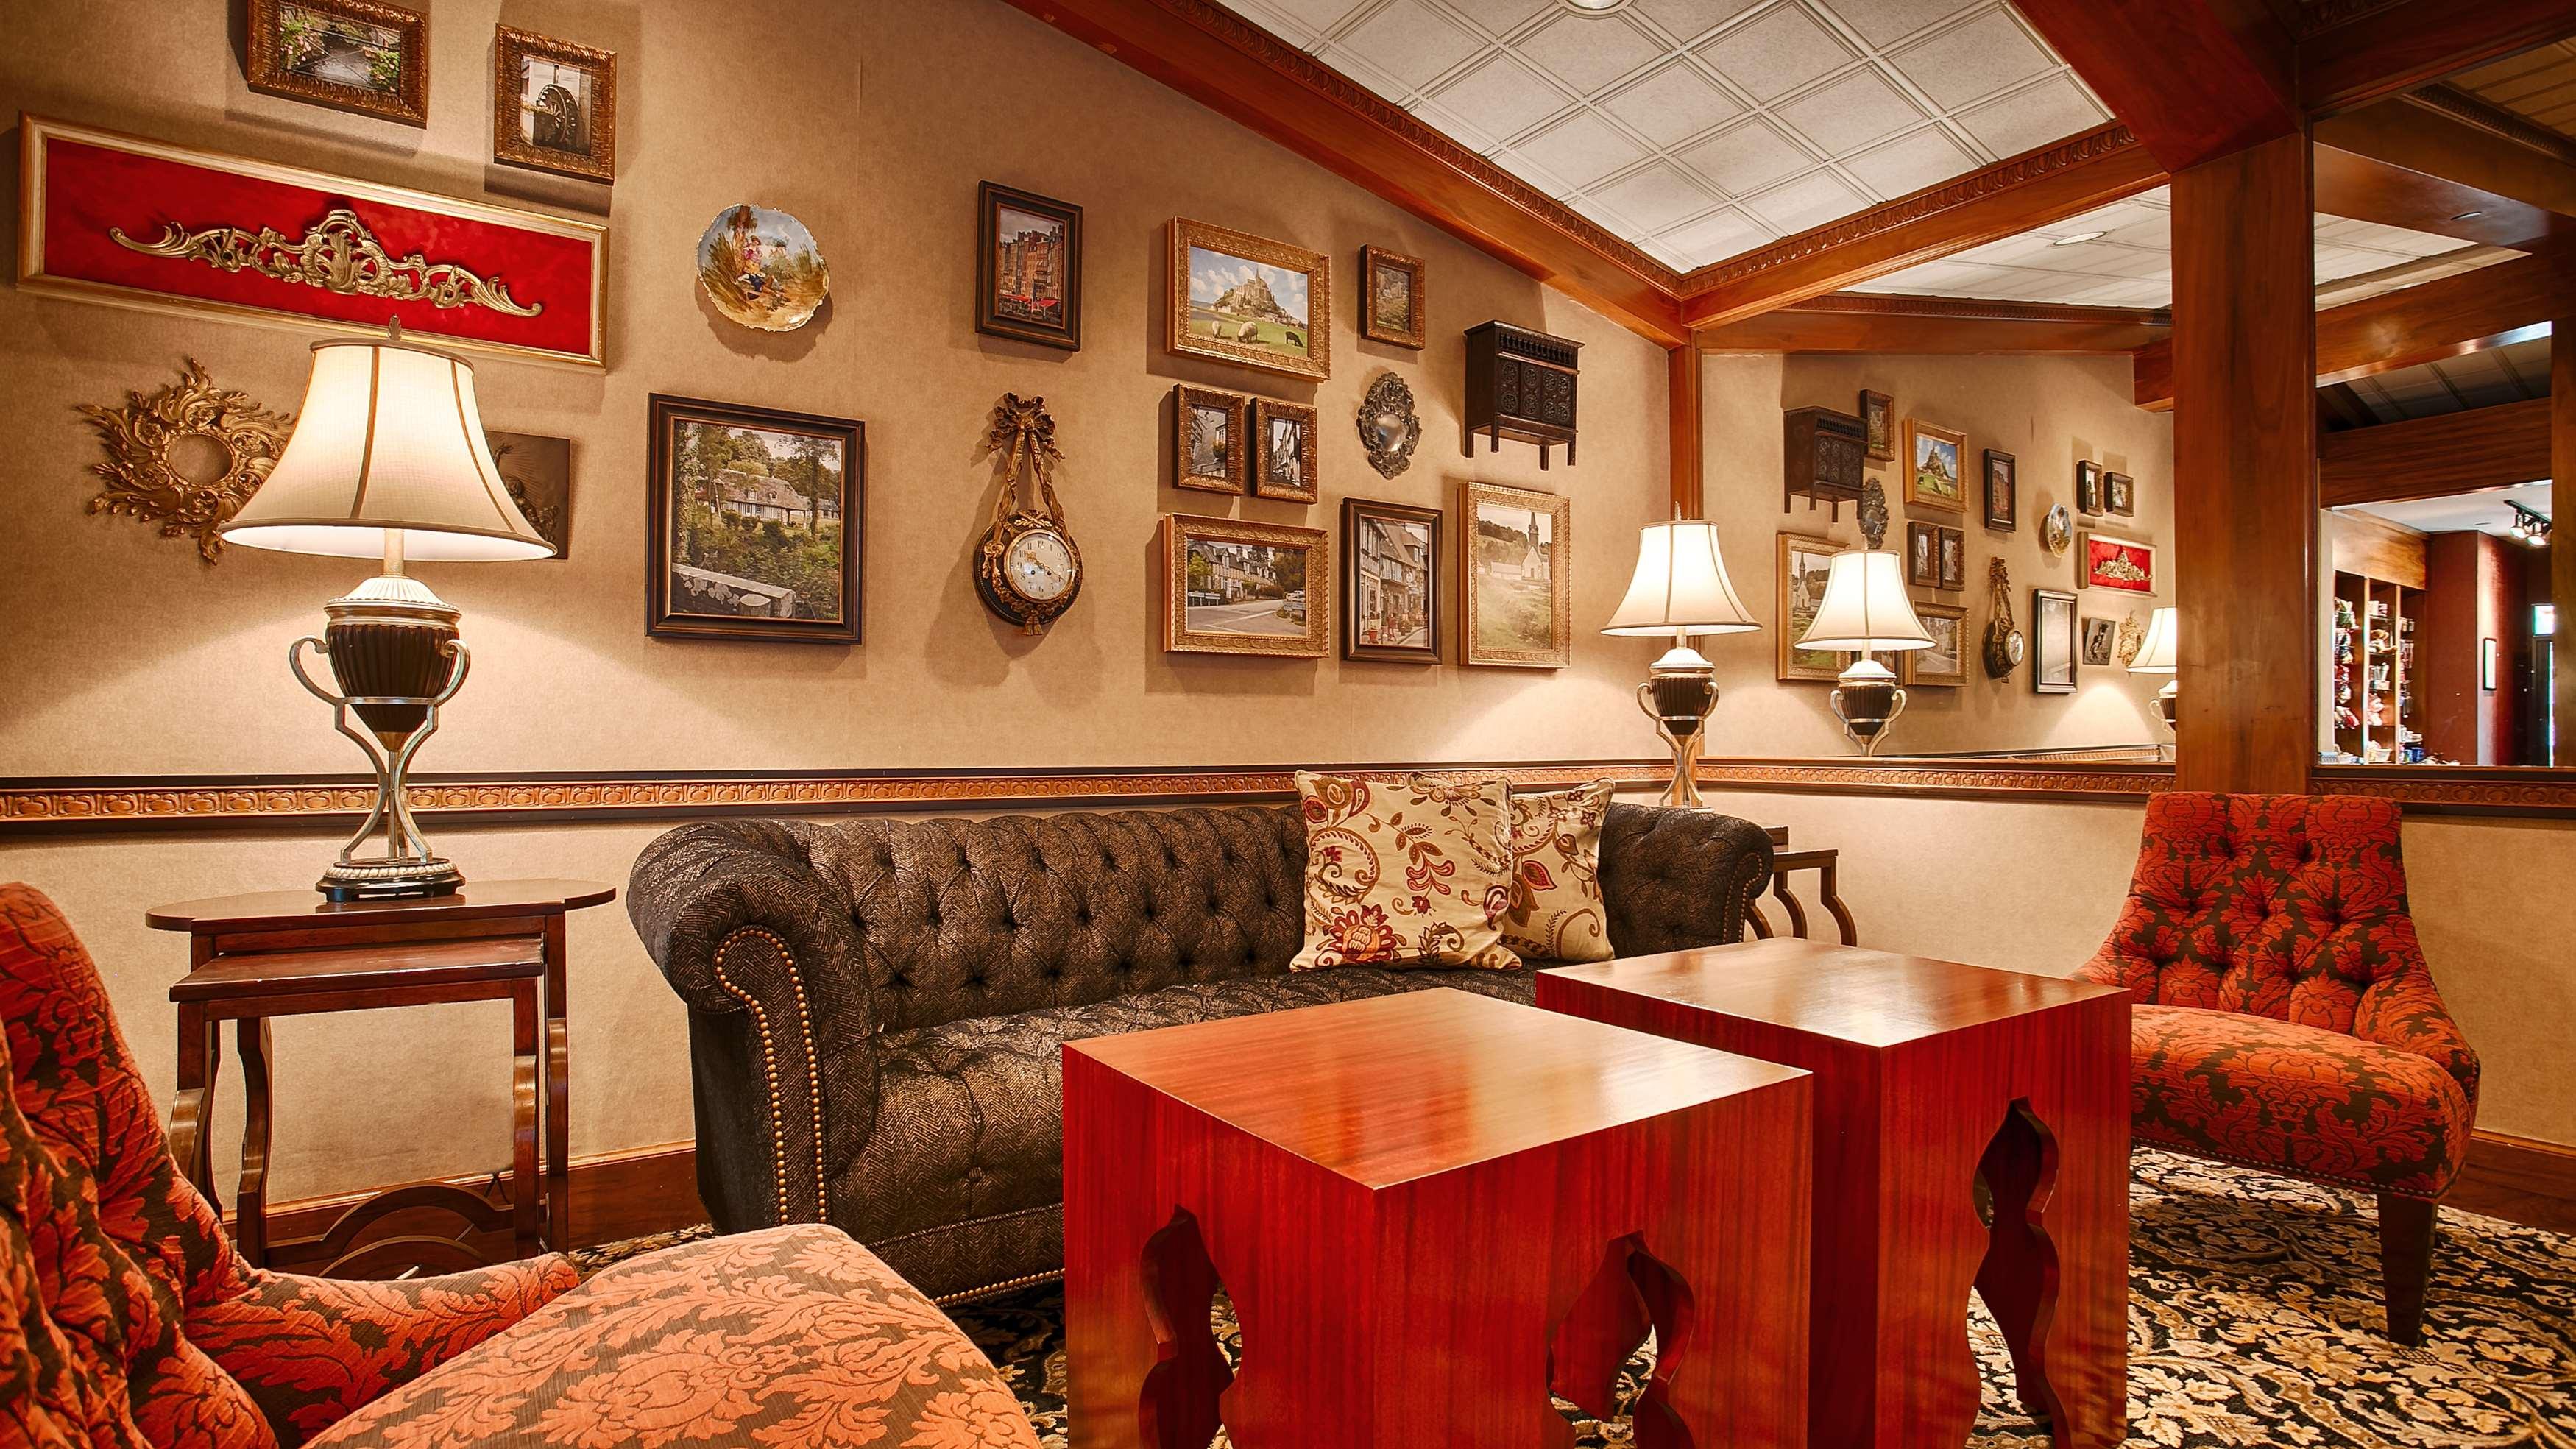 Best Western Plus The Normandy Inn & Suites image 3